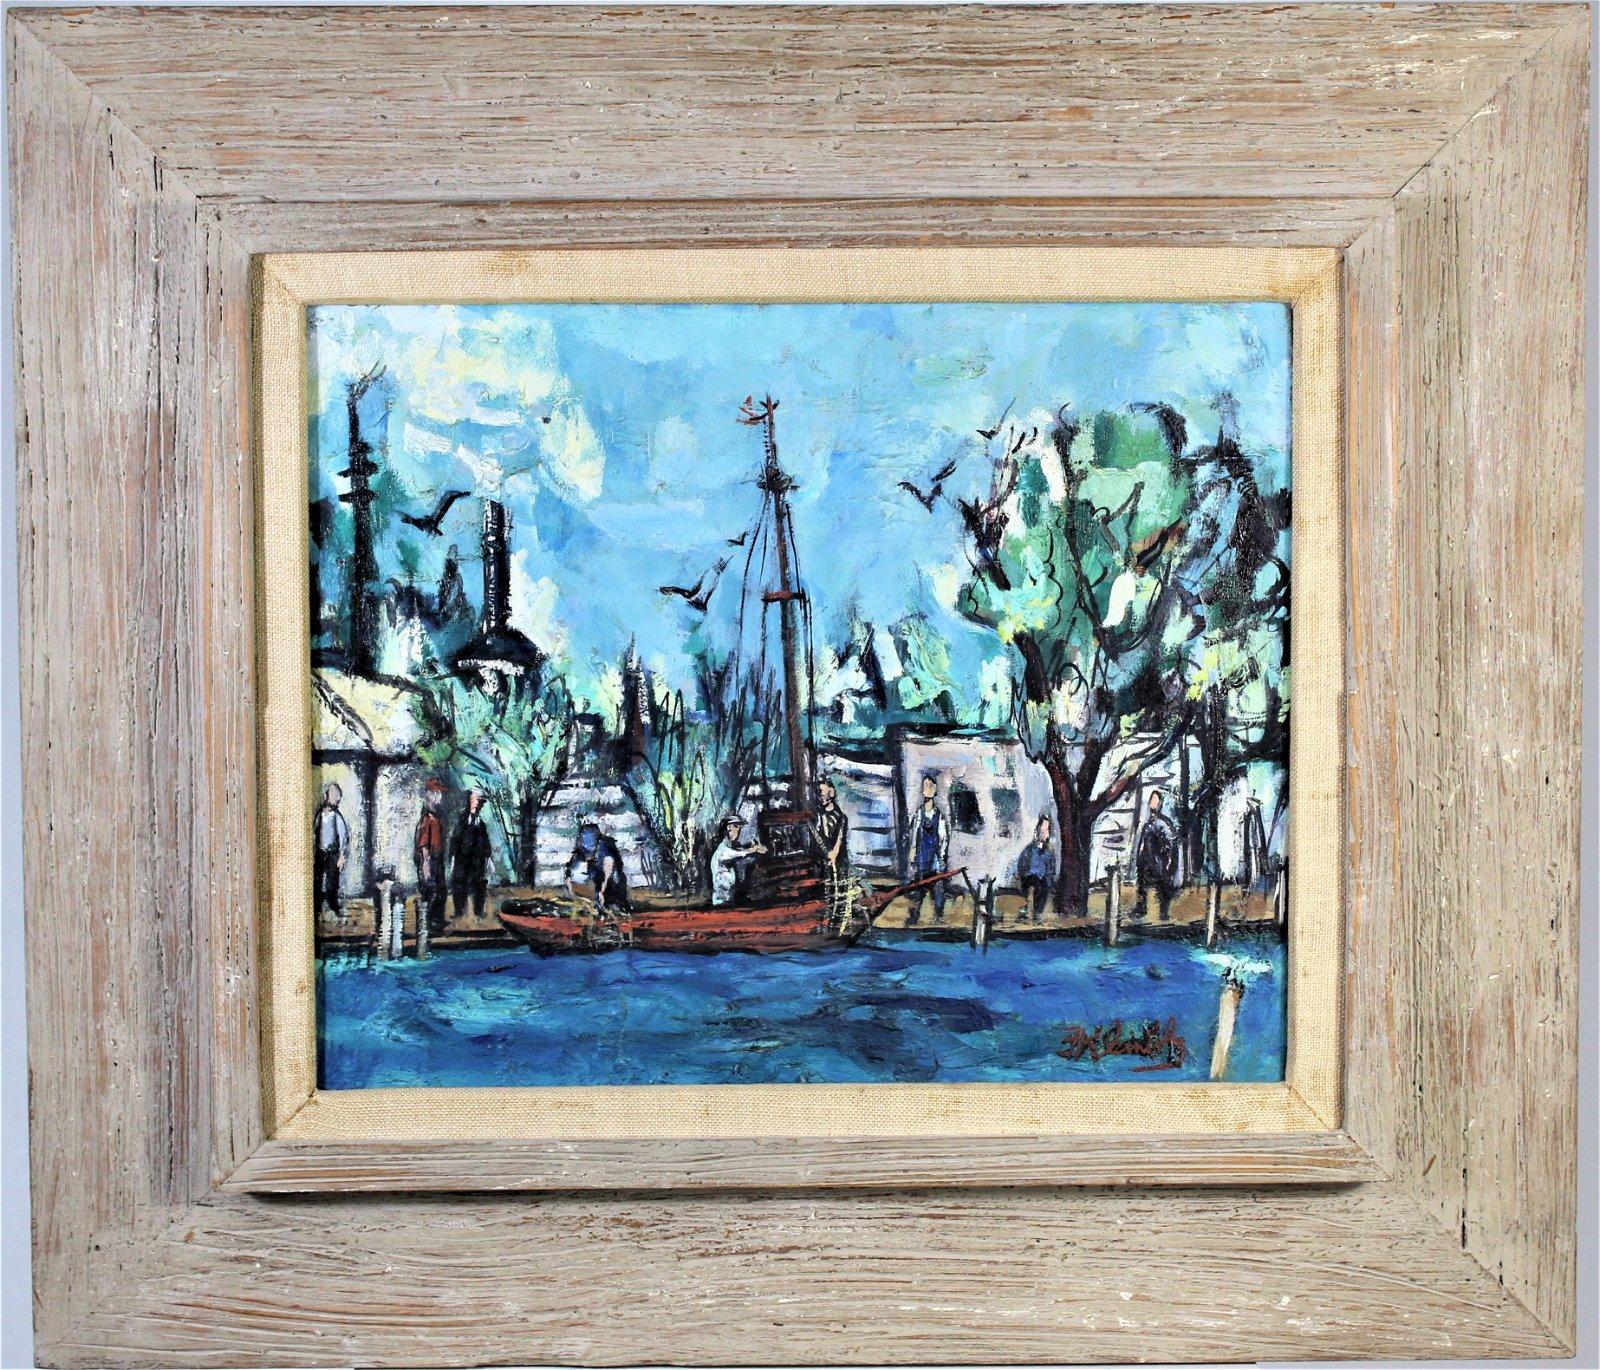 Frank Kleinholz (1901-1987) American, Oil / Canvas